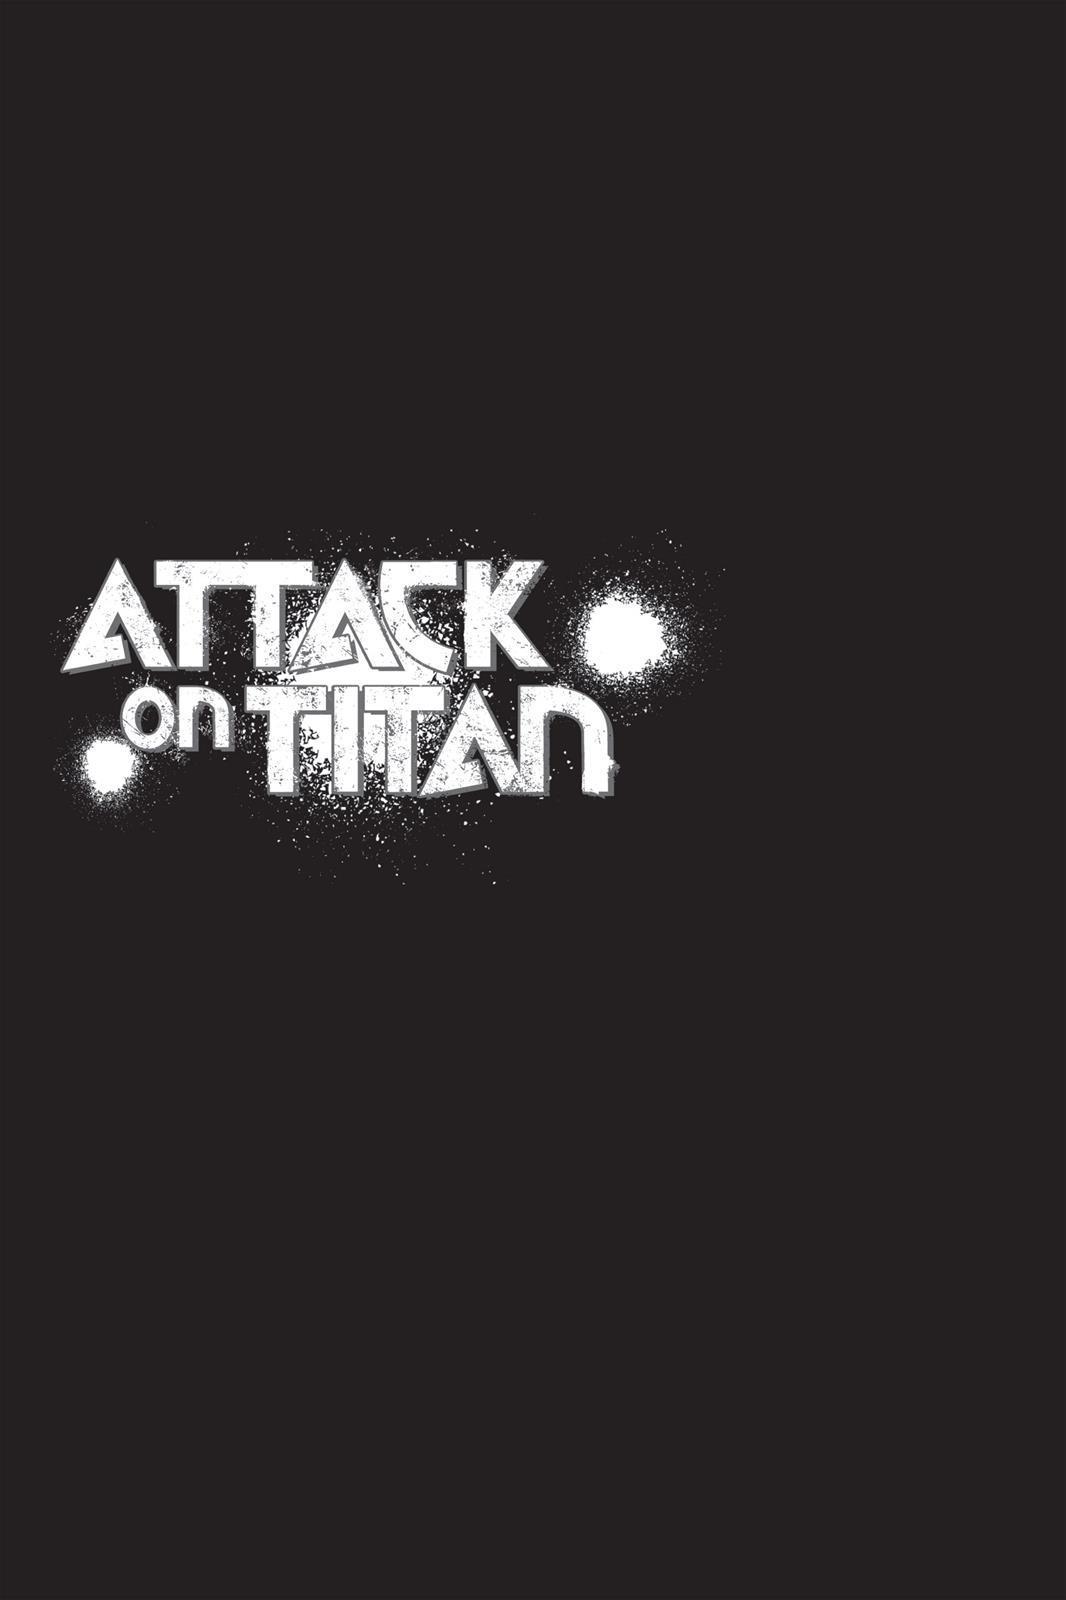 Attack On Titan, Episode 9.5 image 006